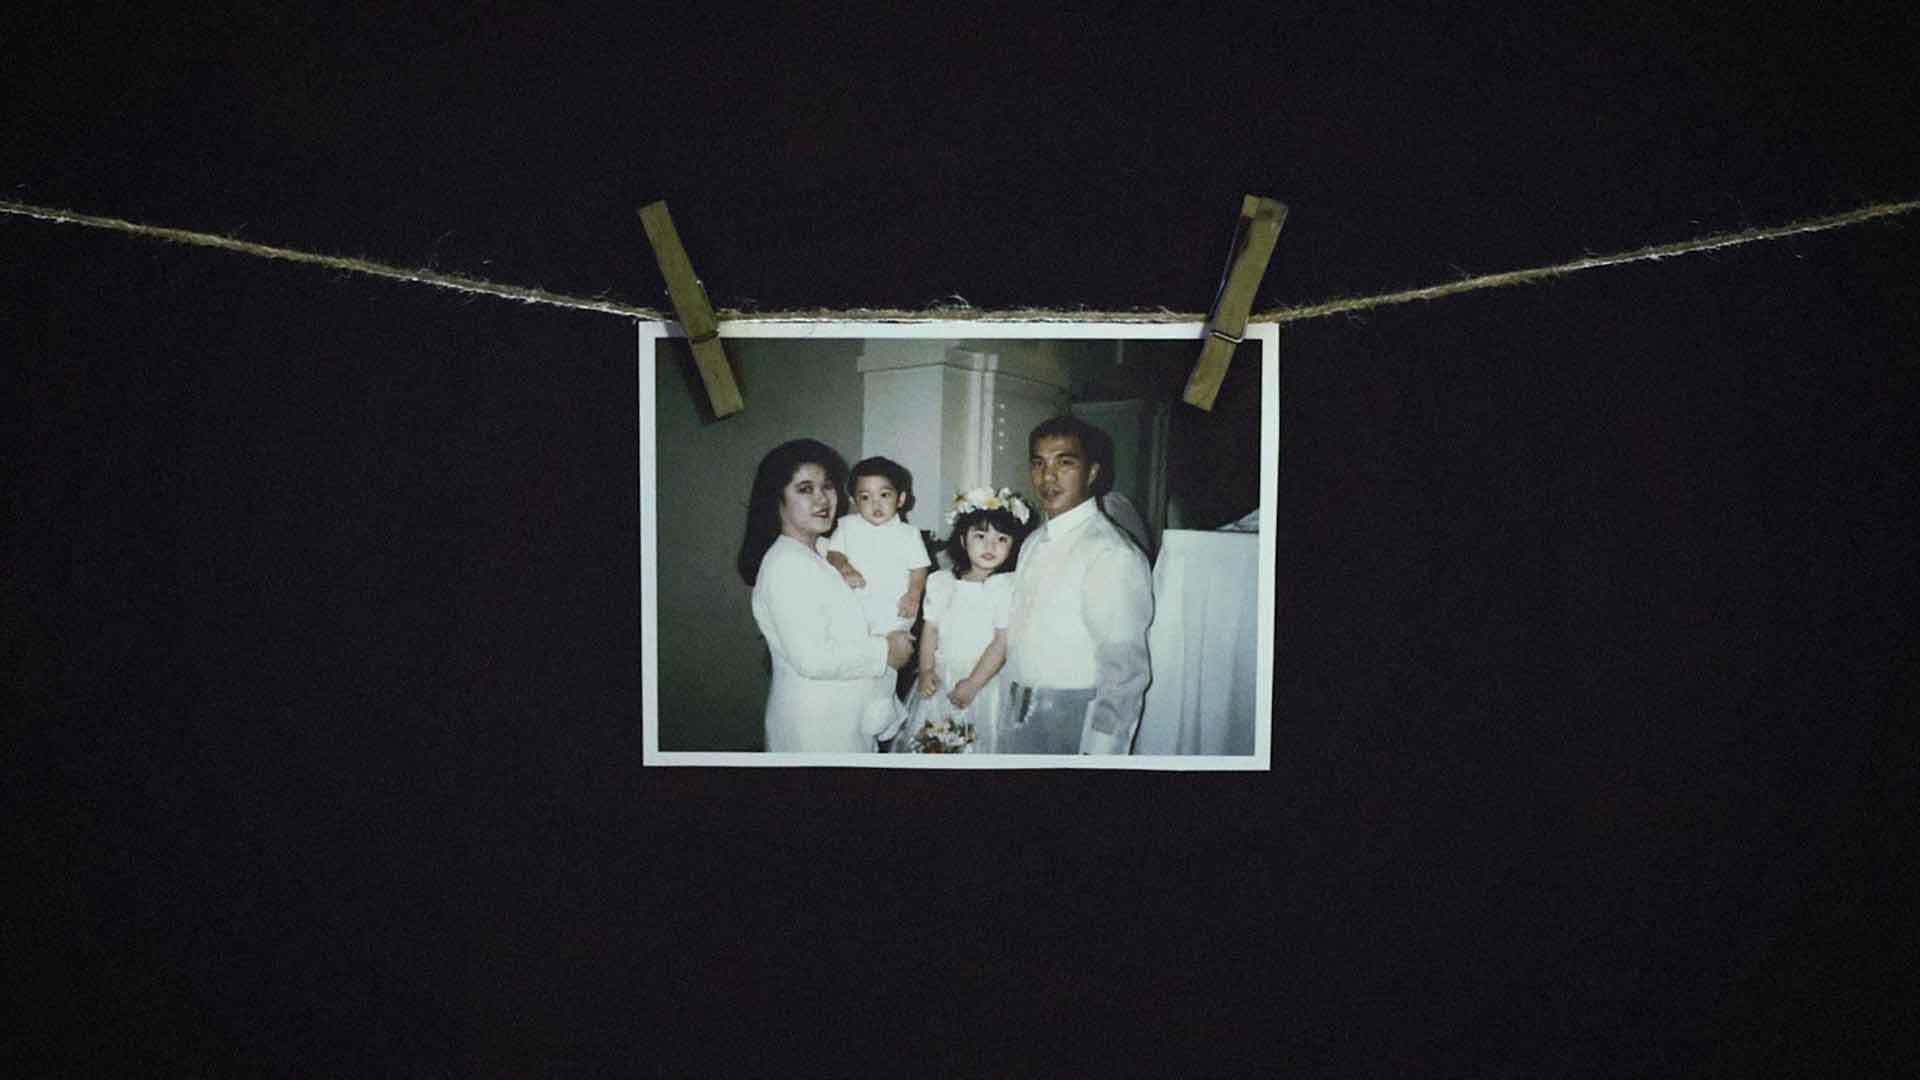 In this family film still 002